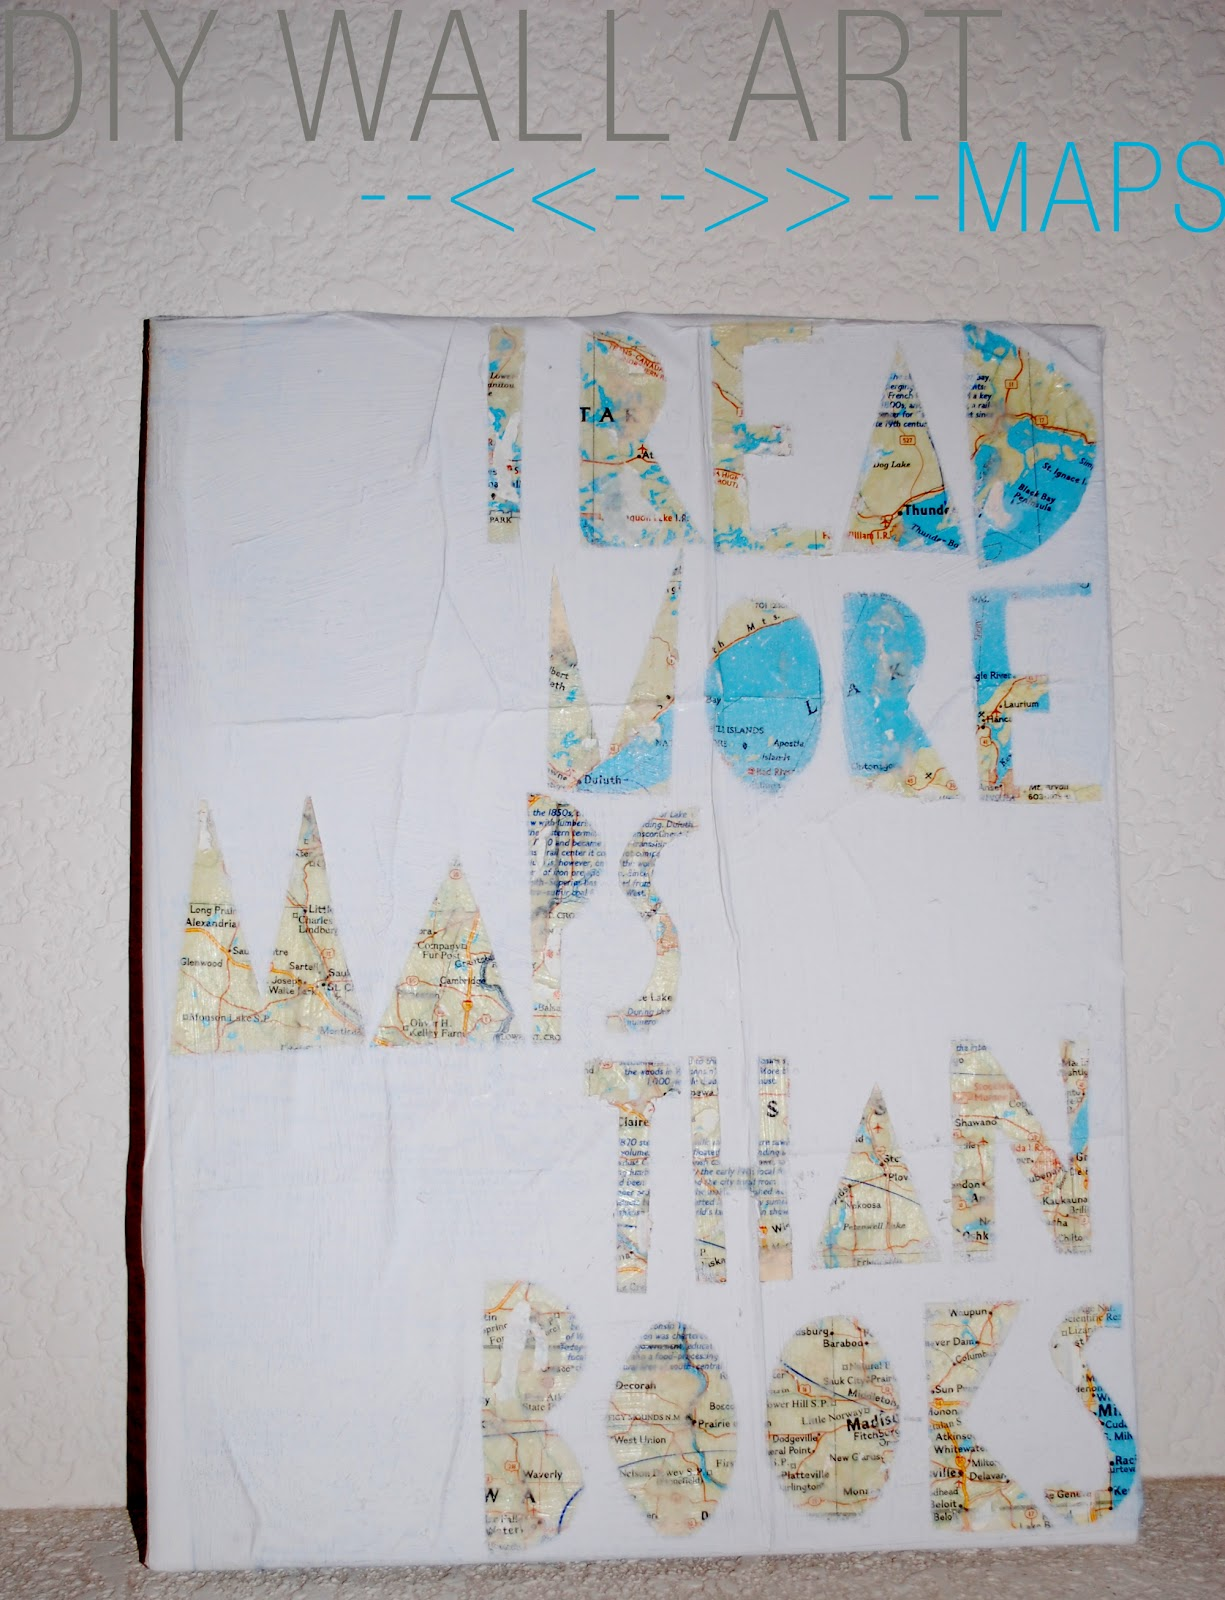 A diamond mind diy map wall art for Diy map wall art